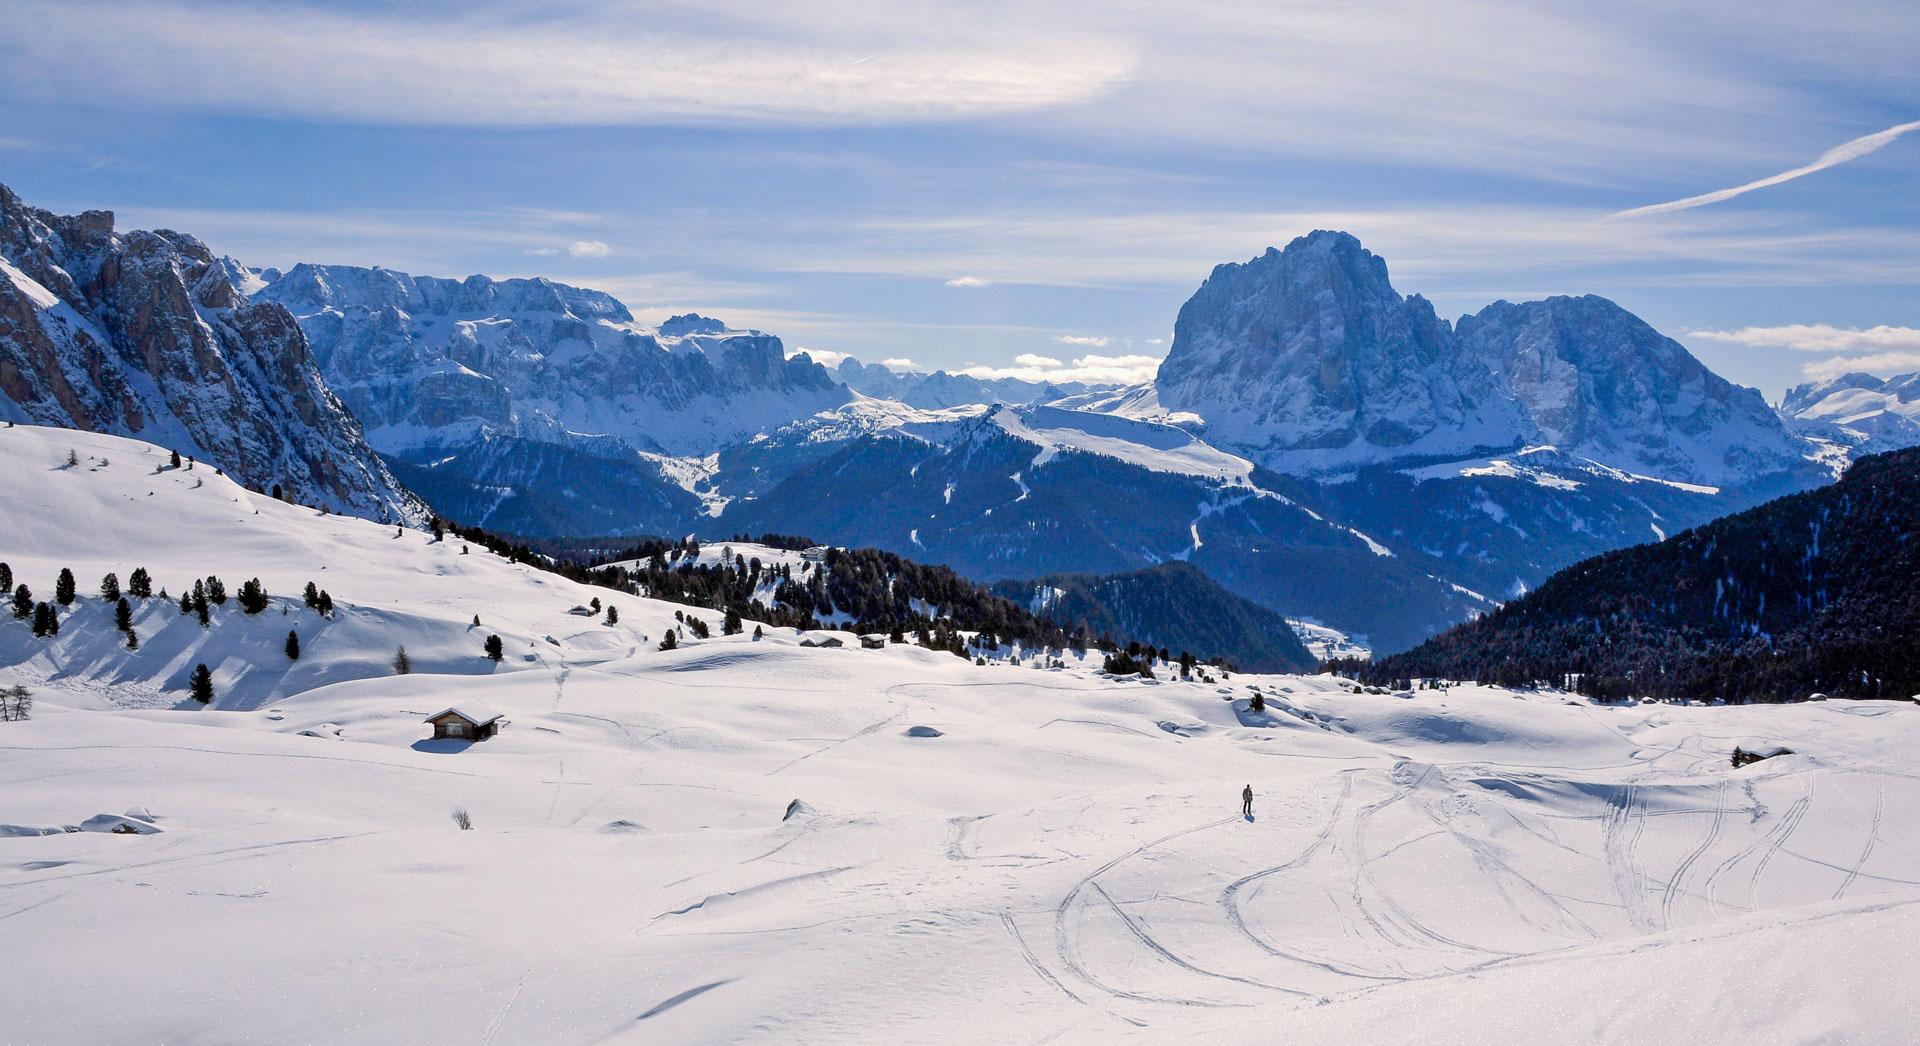 Single skier enjoying an off-piste beginner lesson in the mountains of Val Gardena